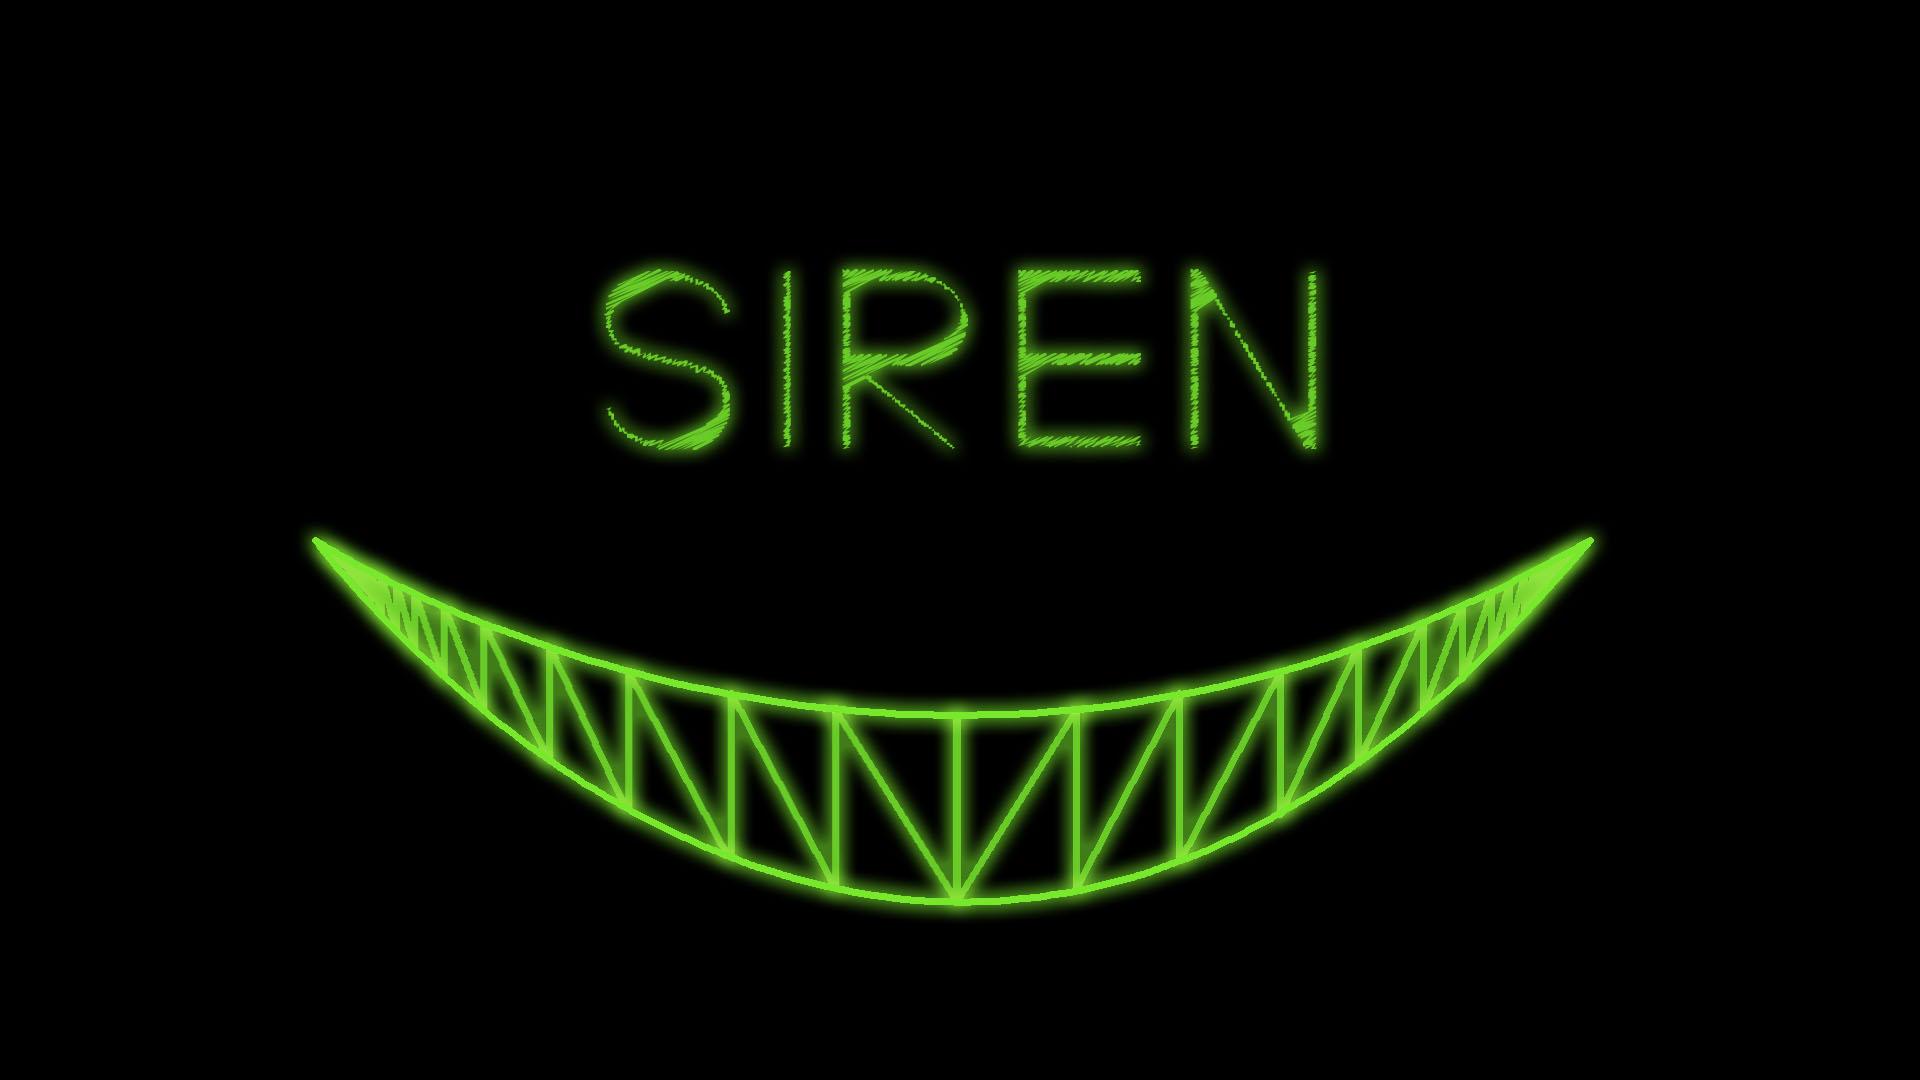 SirenLogo.jpg